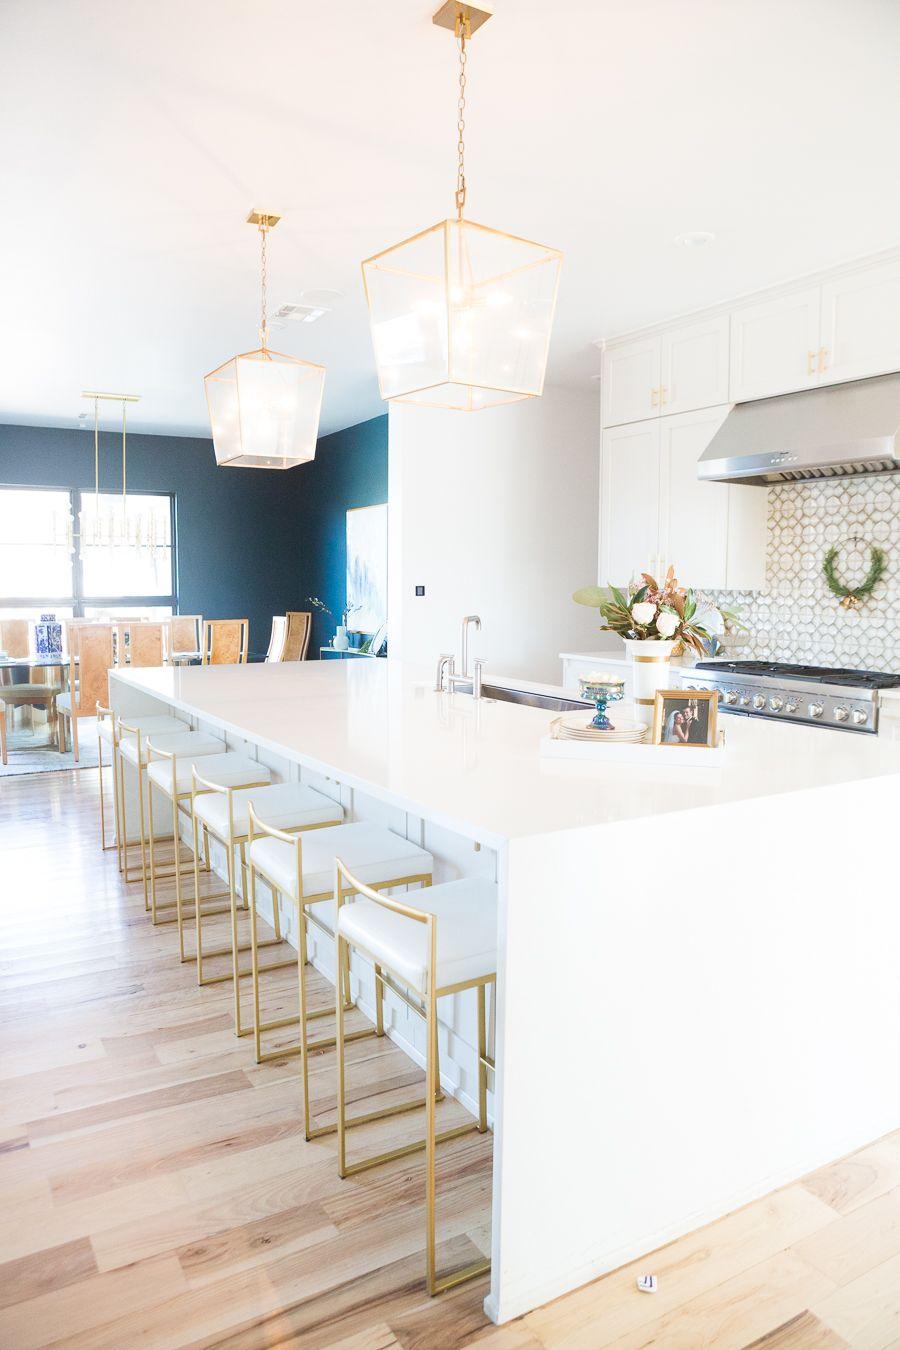 10 Affordable Gold Bar Stools for Home Design Home decor